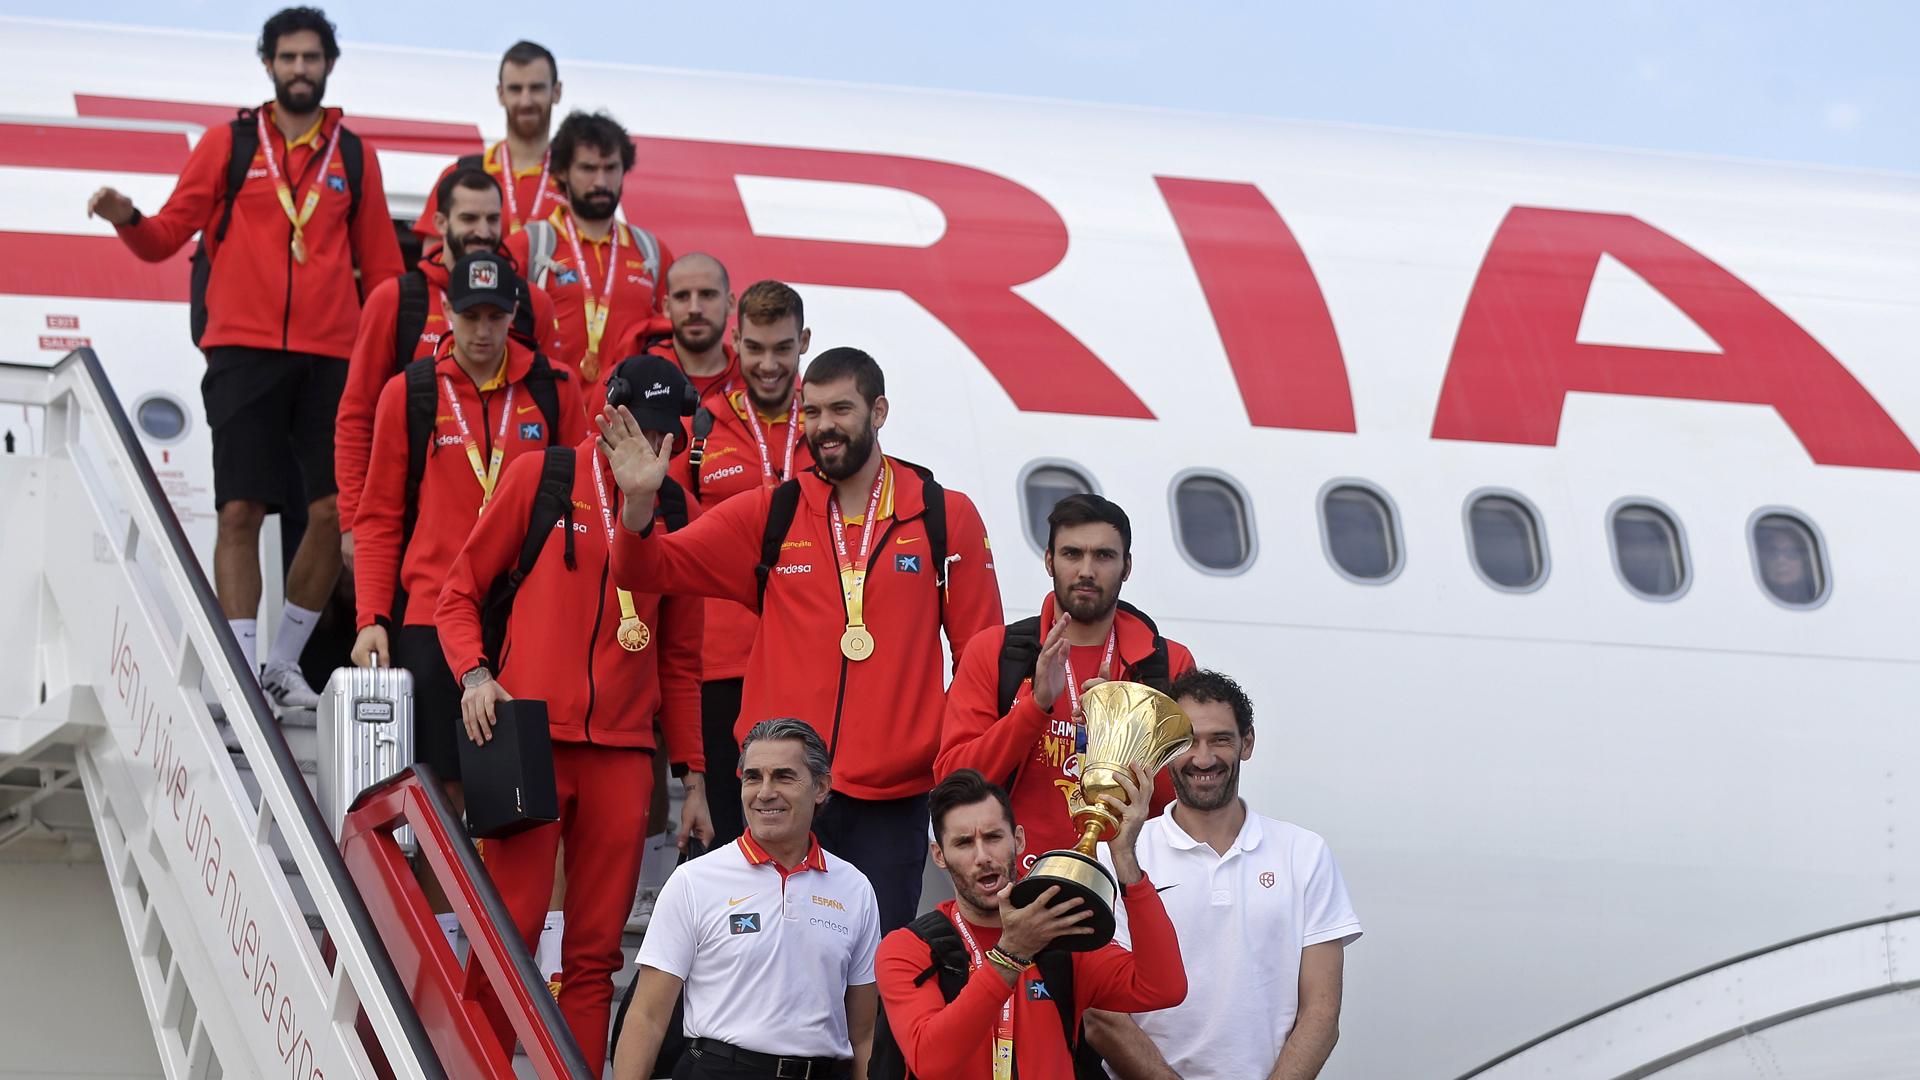 España celebra su triunfo en la Copa Mundial de baloncesto